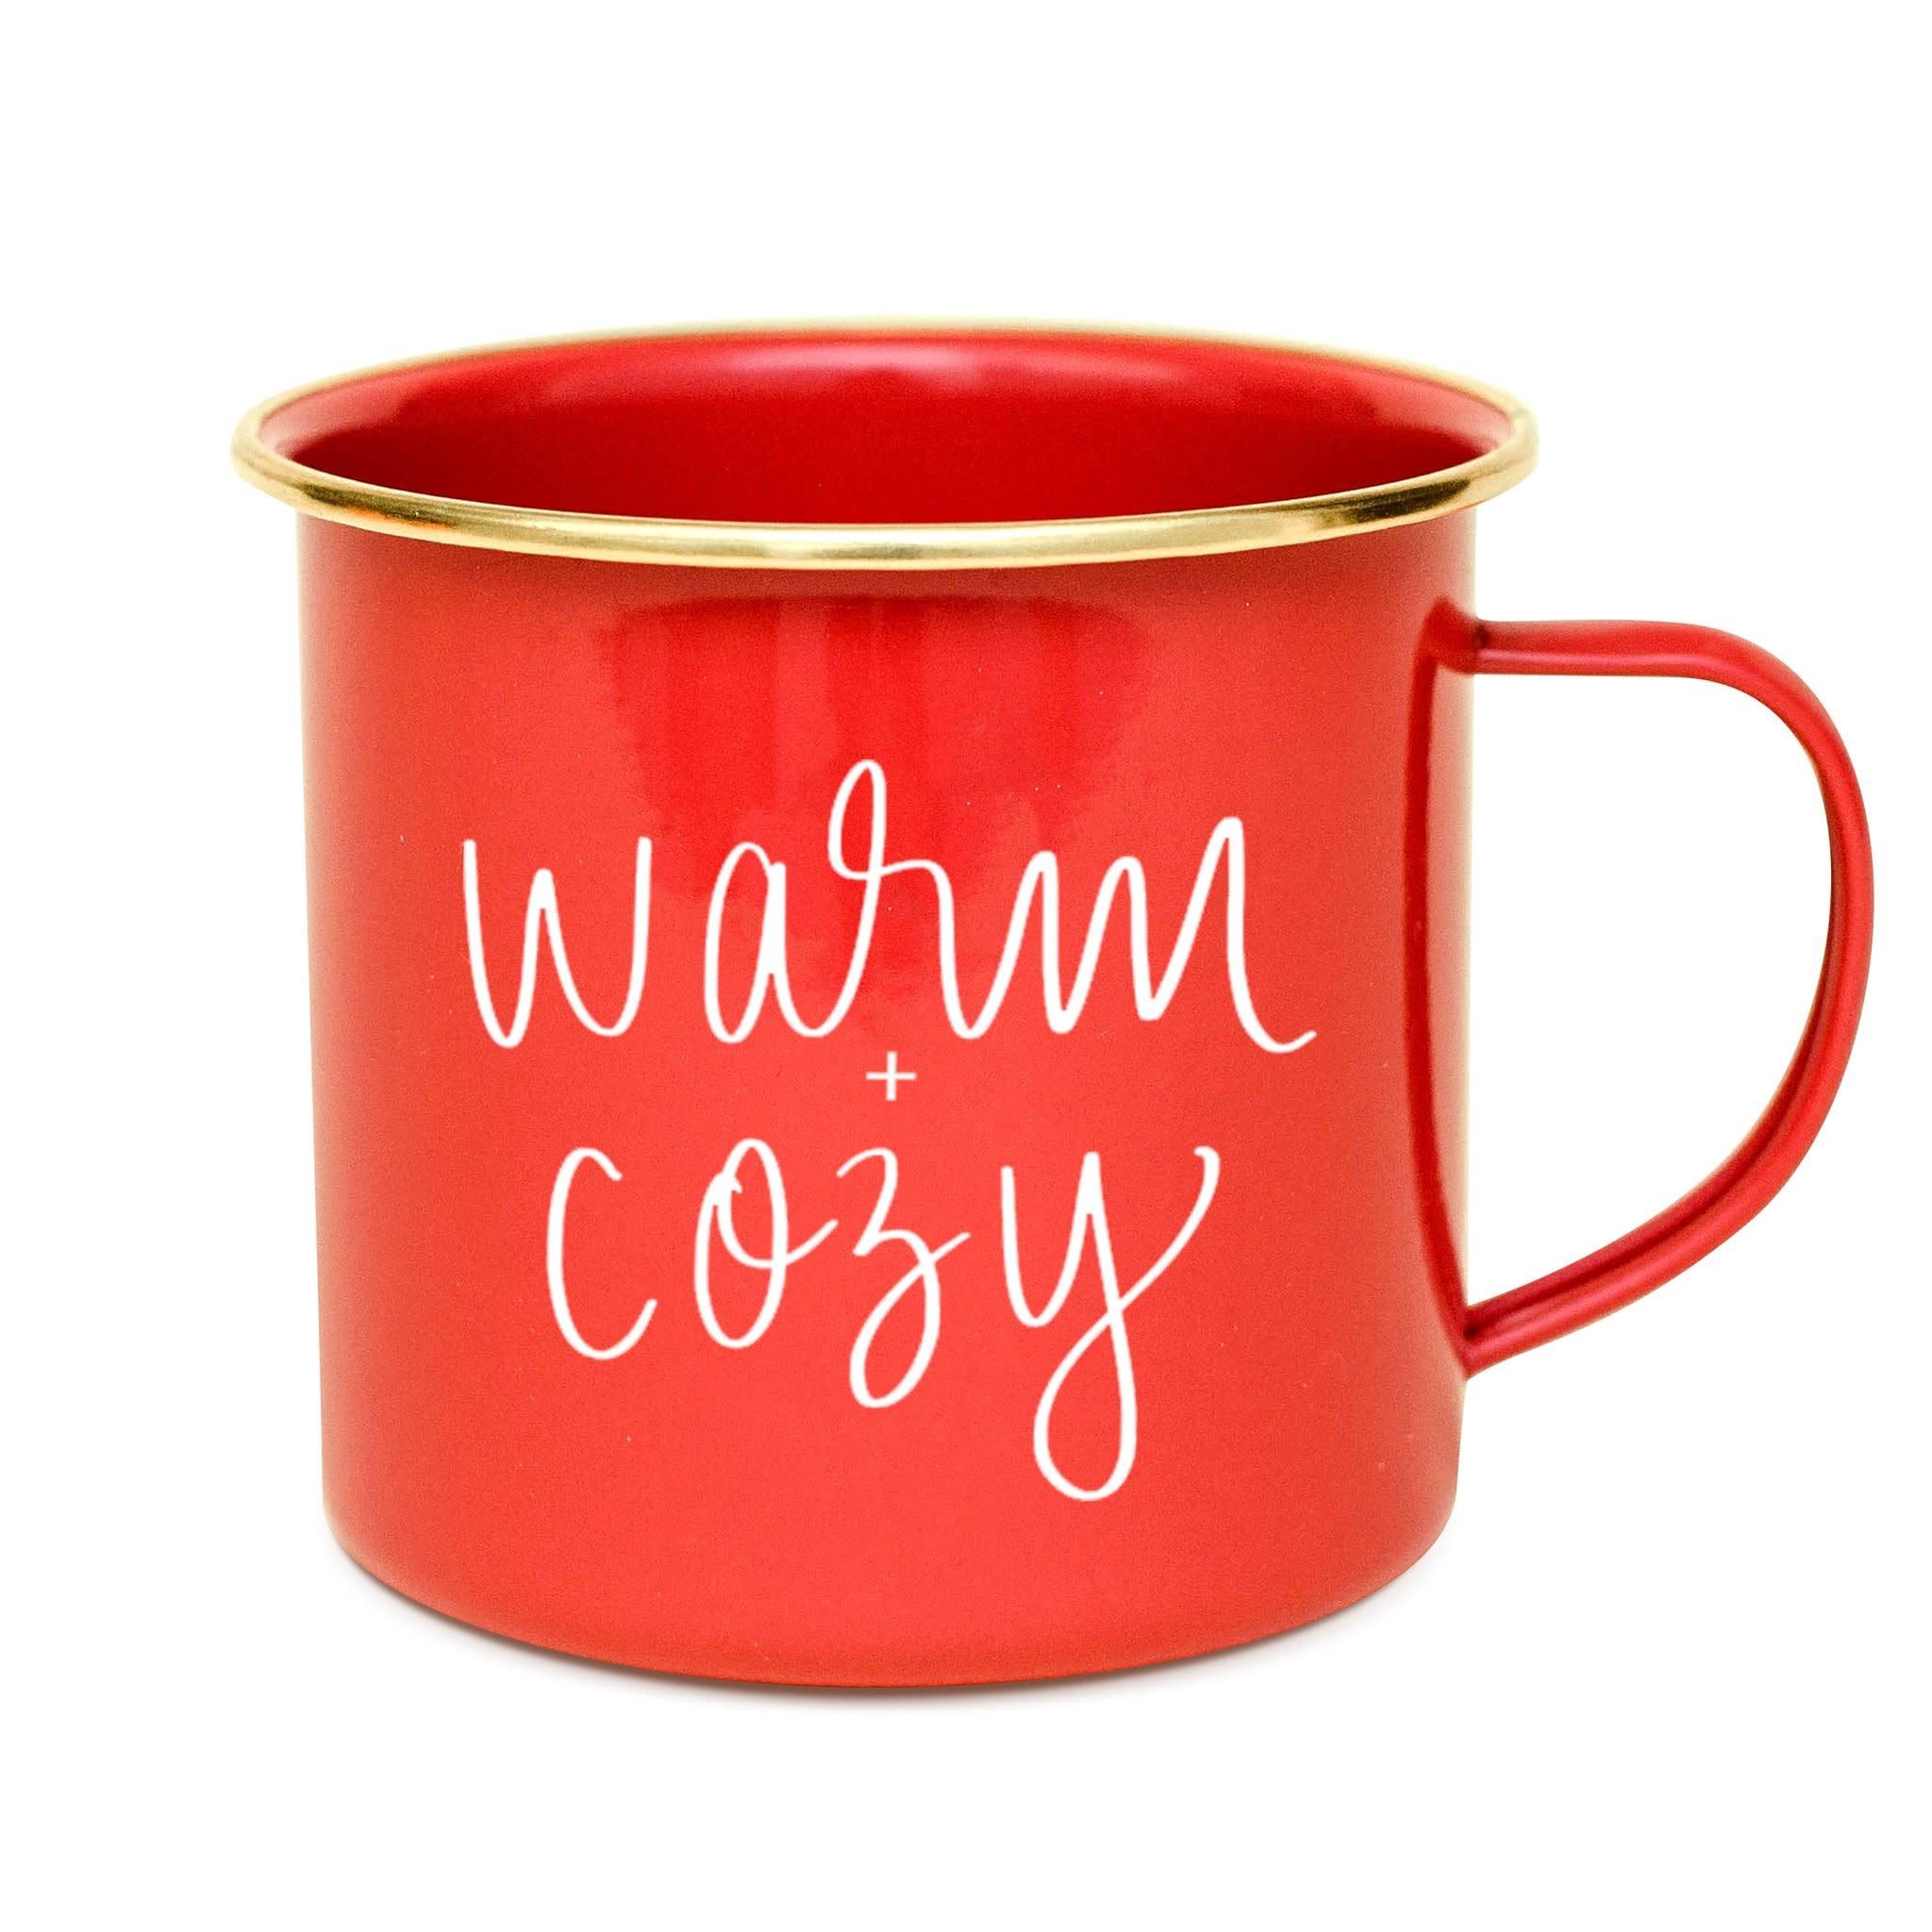 Warm & Cozy Campfire Coffee Mug